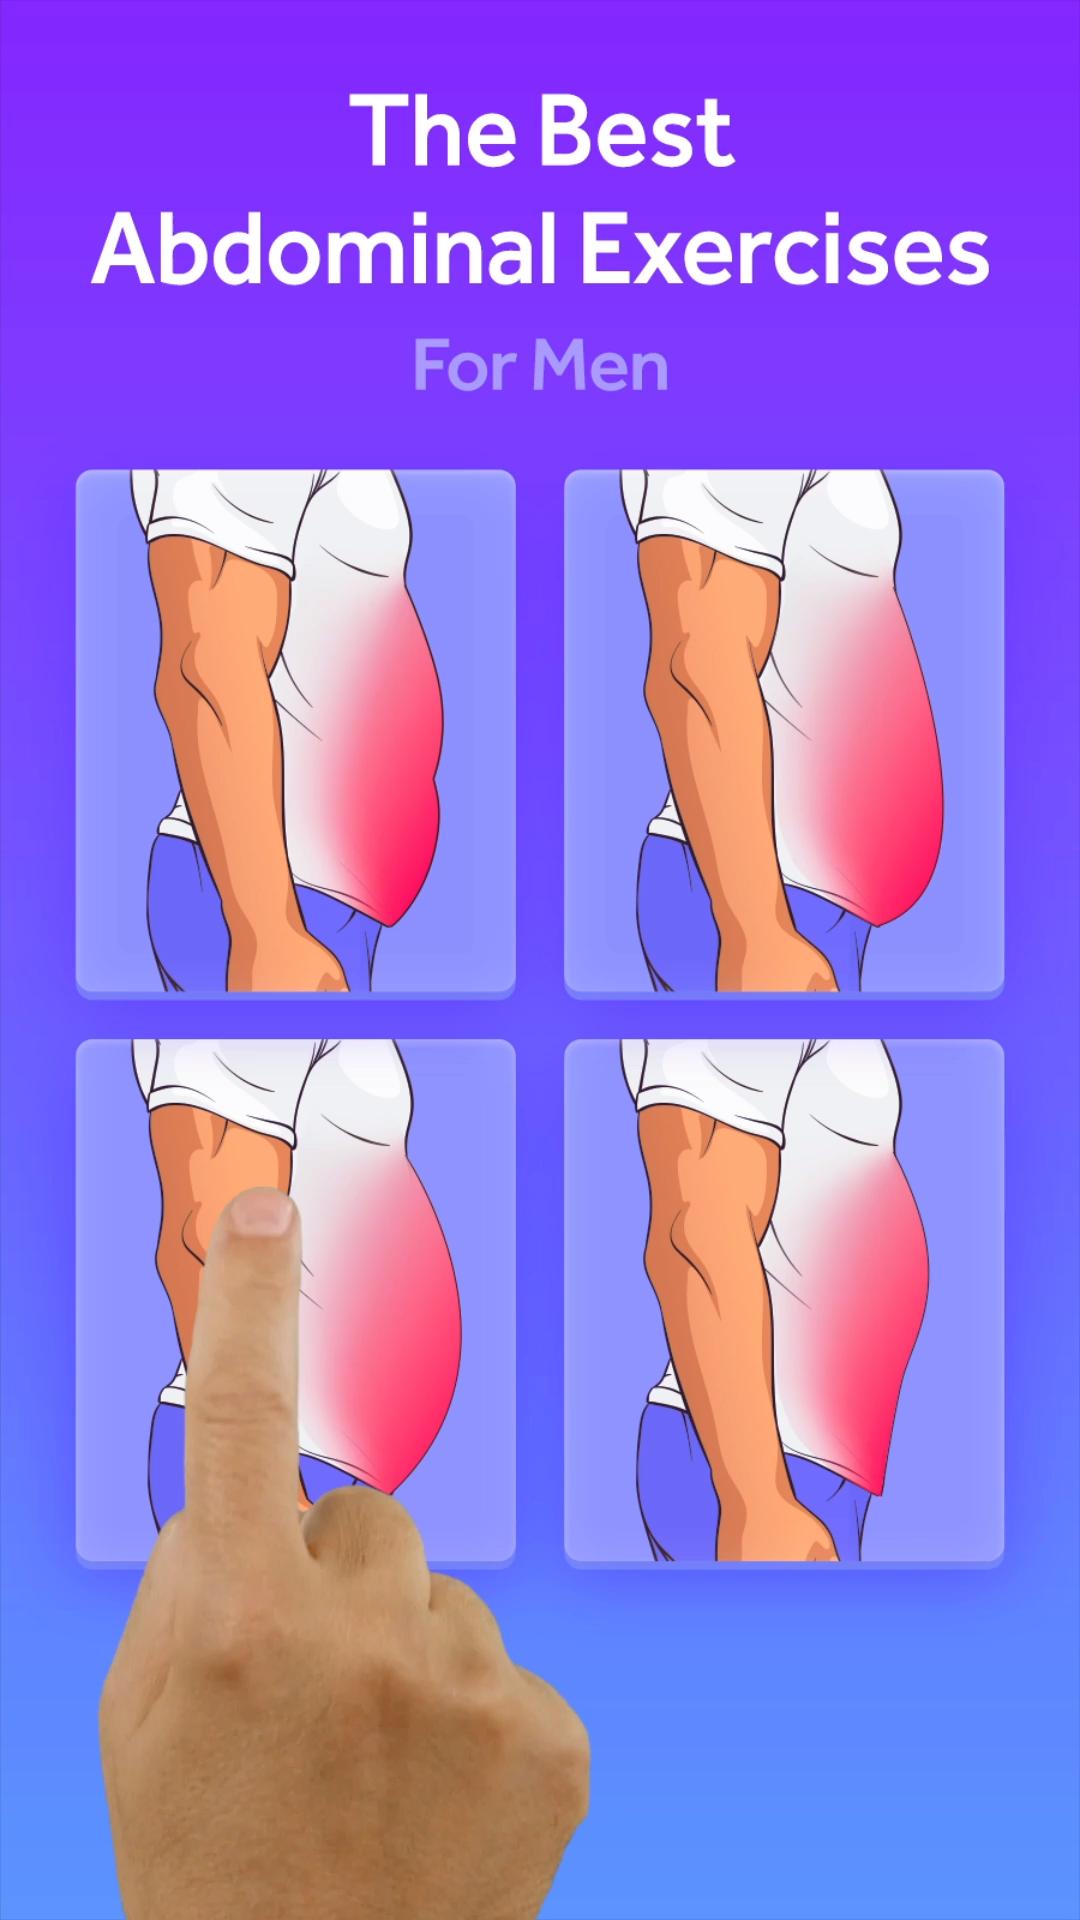 Effective abdominal exercises